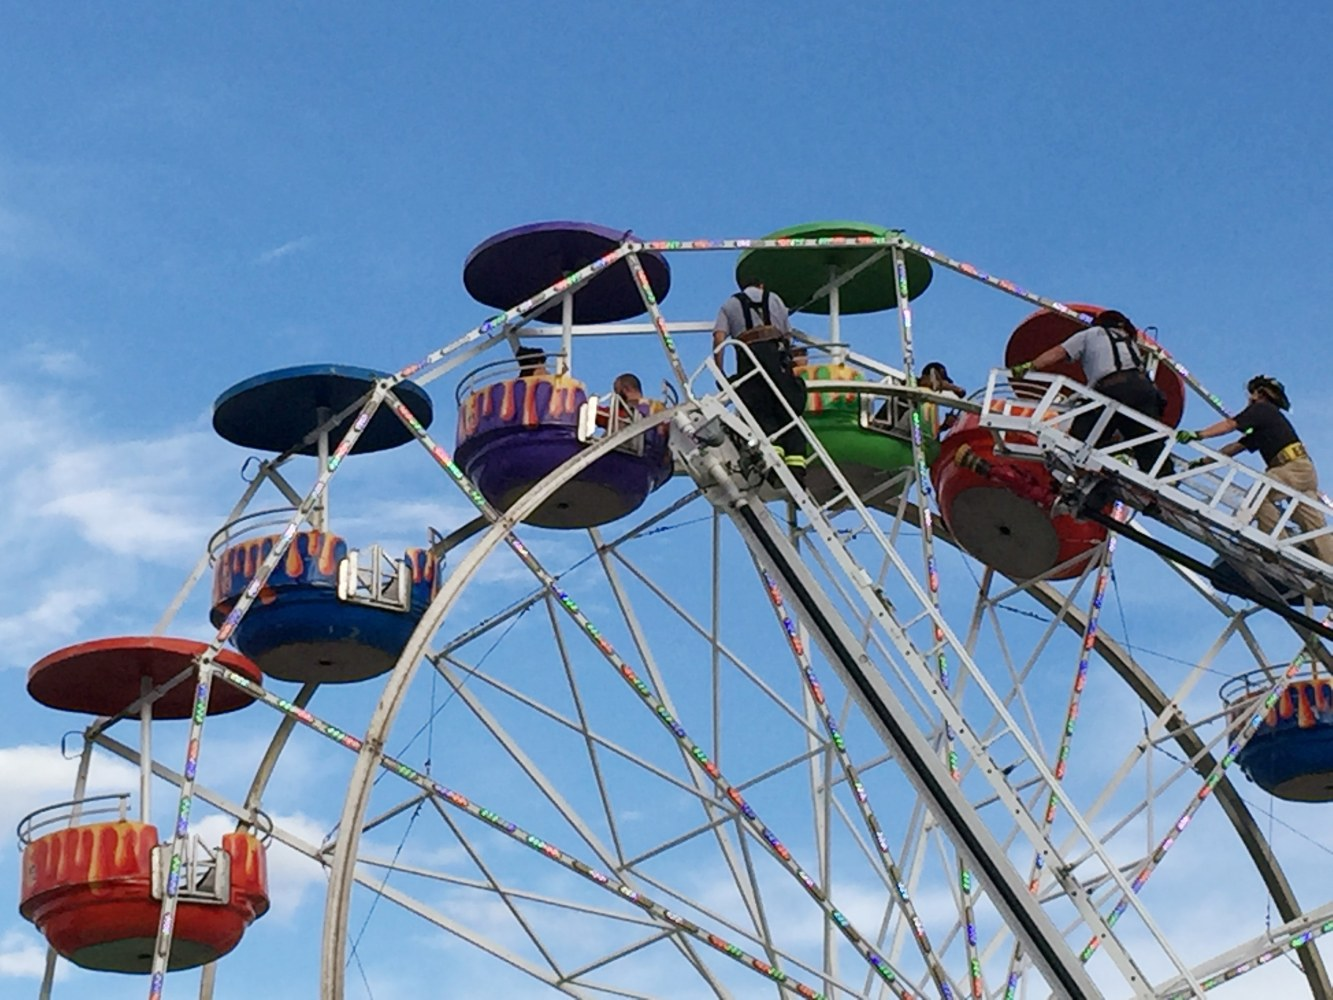 Greene County Fair Ferris Wheel Basket Flips, Injuring ...